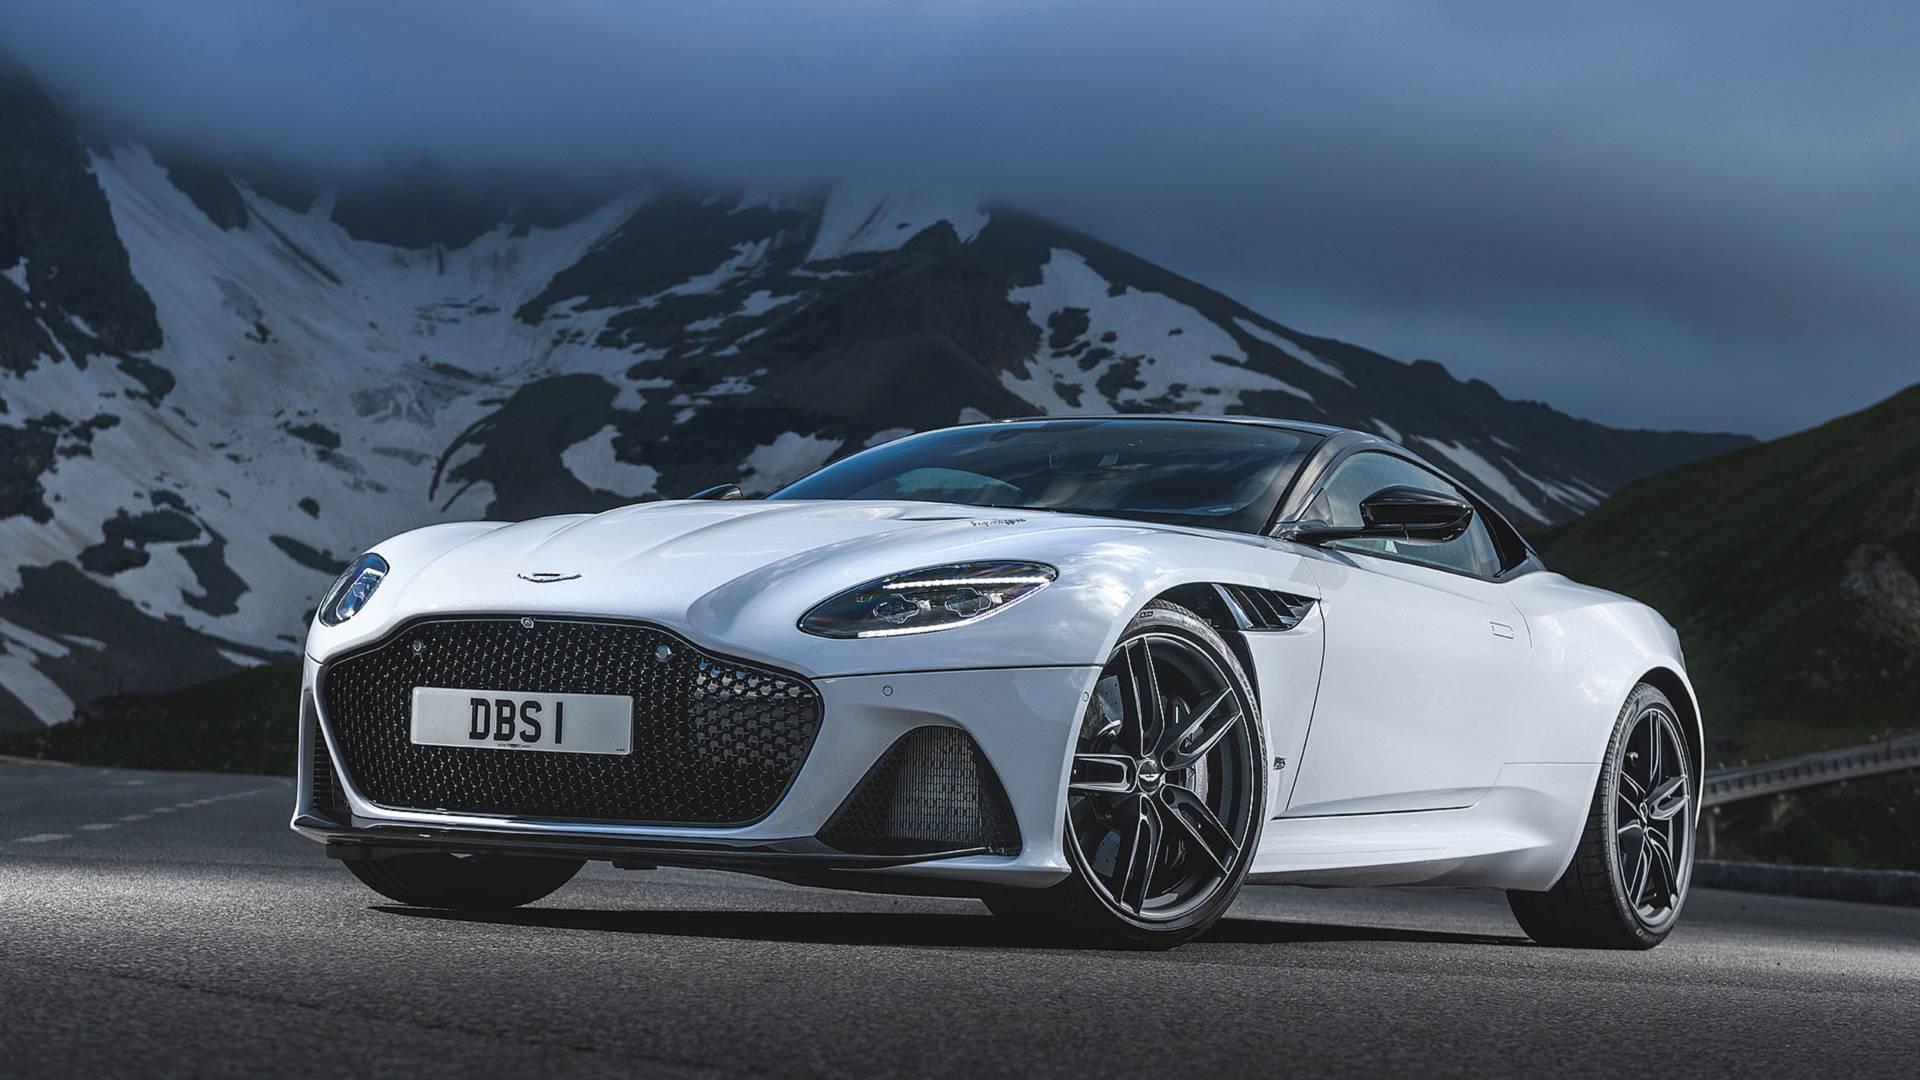 2019 Aston Martin DBS Superleggera First Drive: What's In A ... on